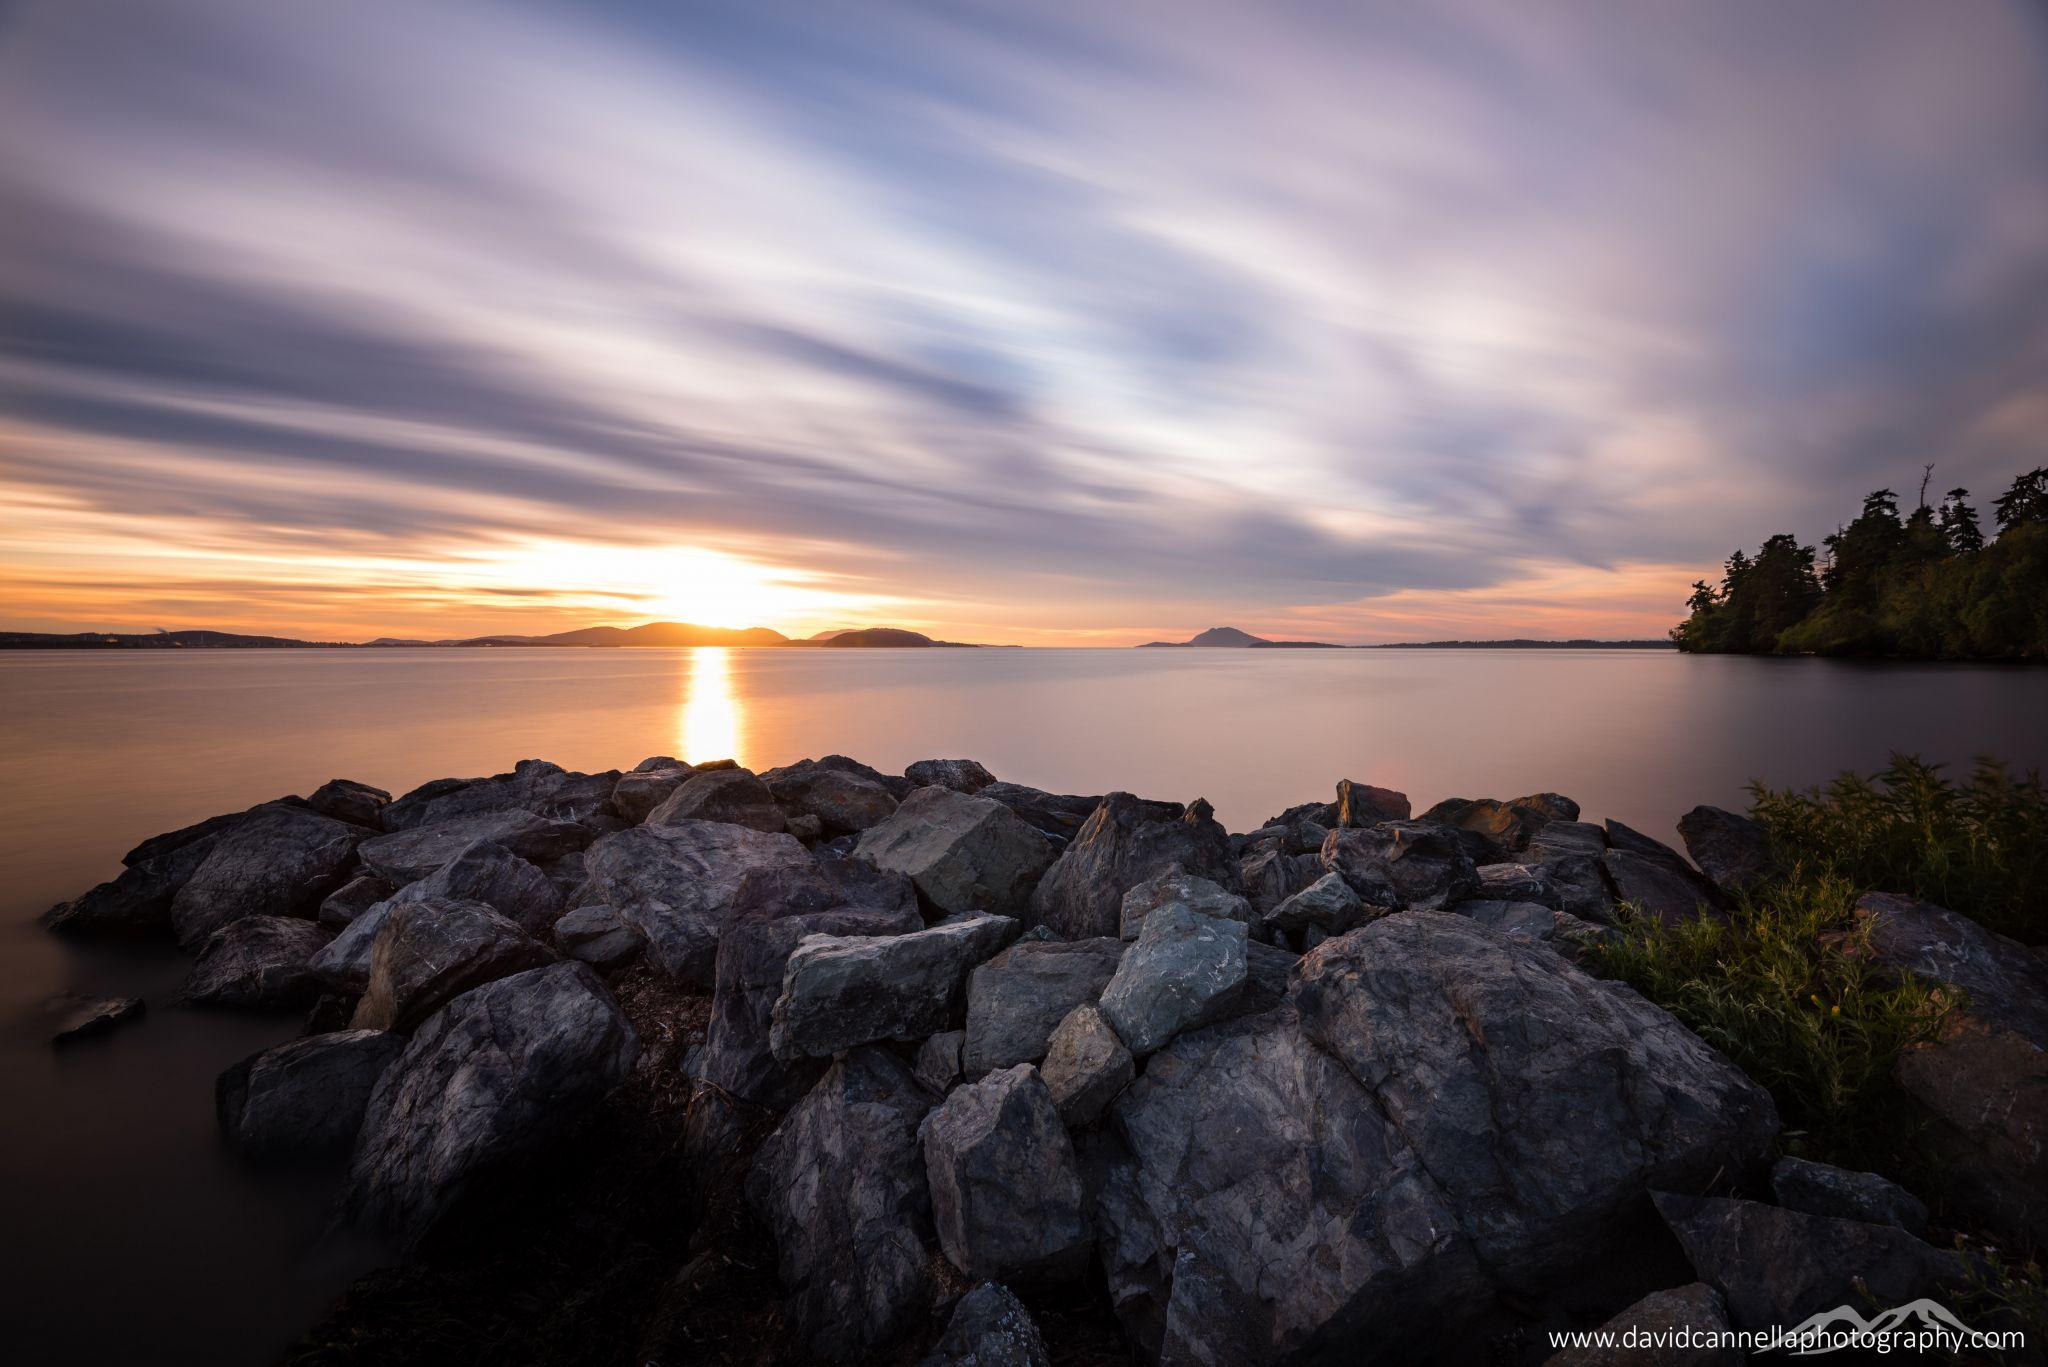 Padilla Bay in Mount Vernon, Washington, USA